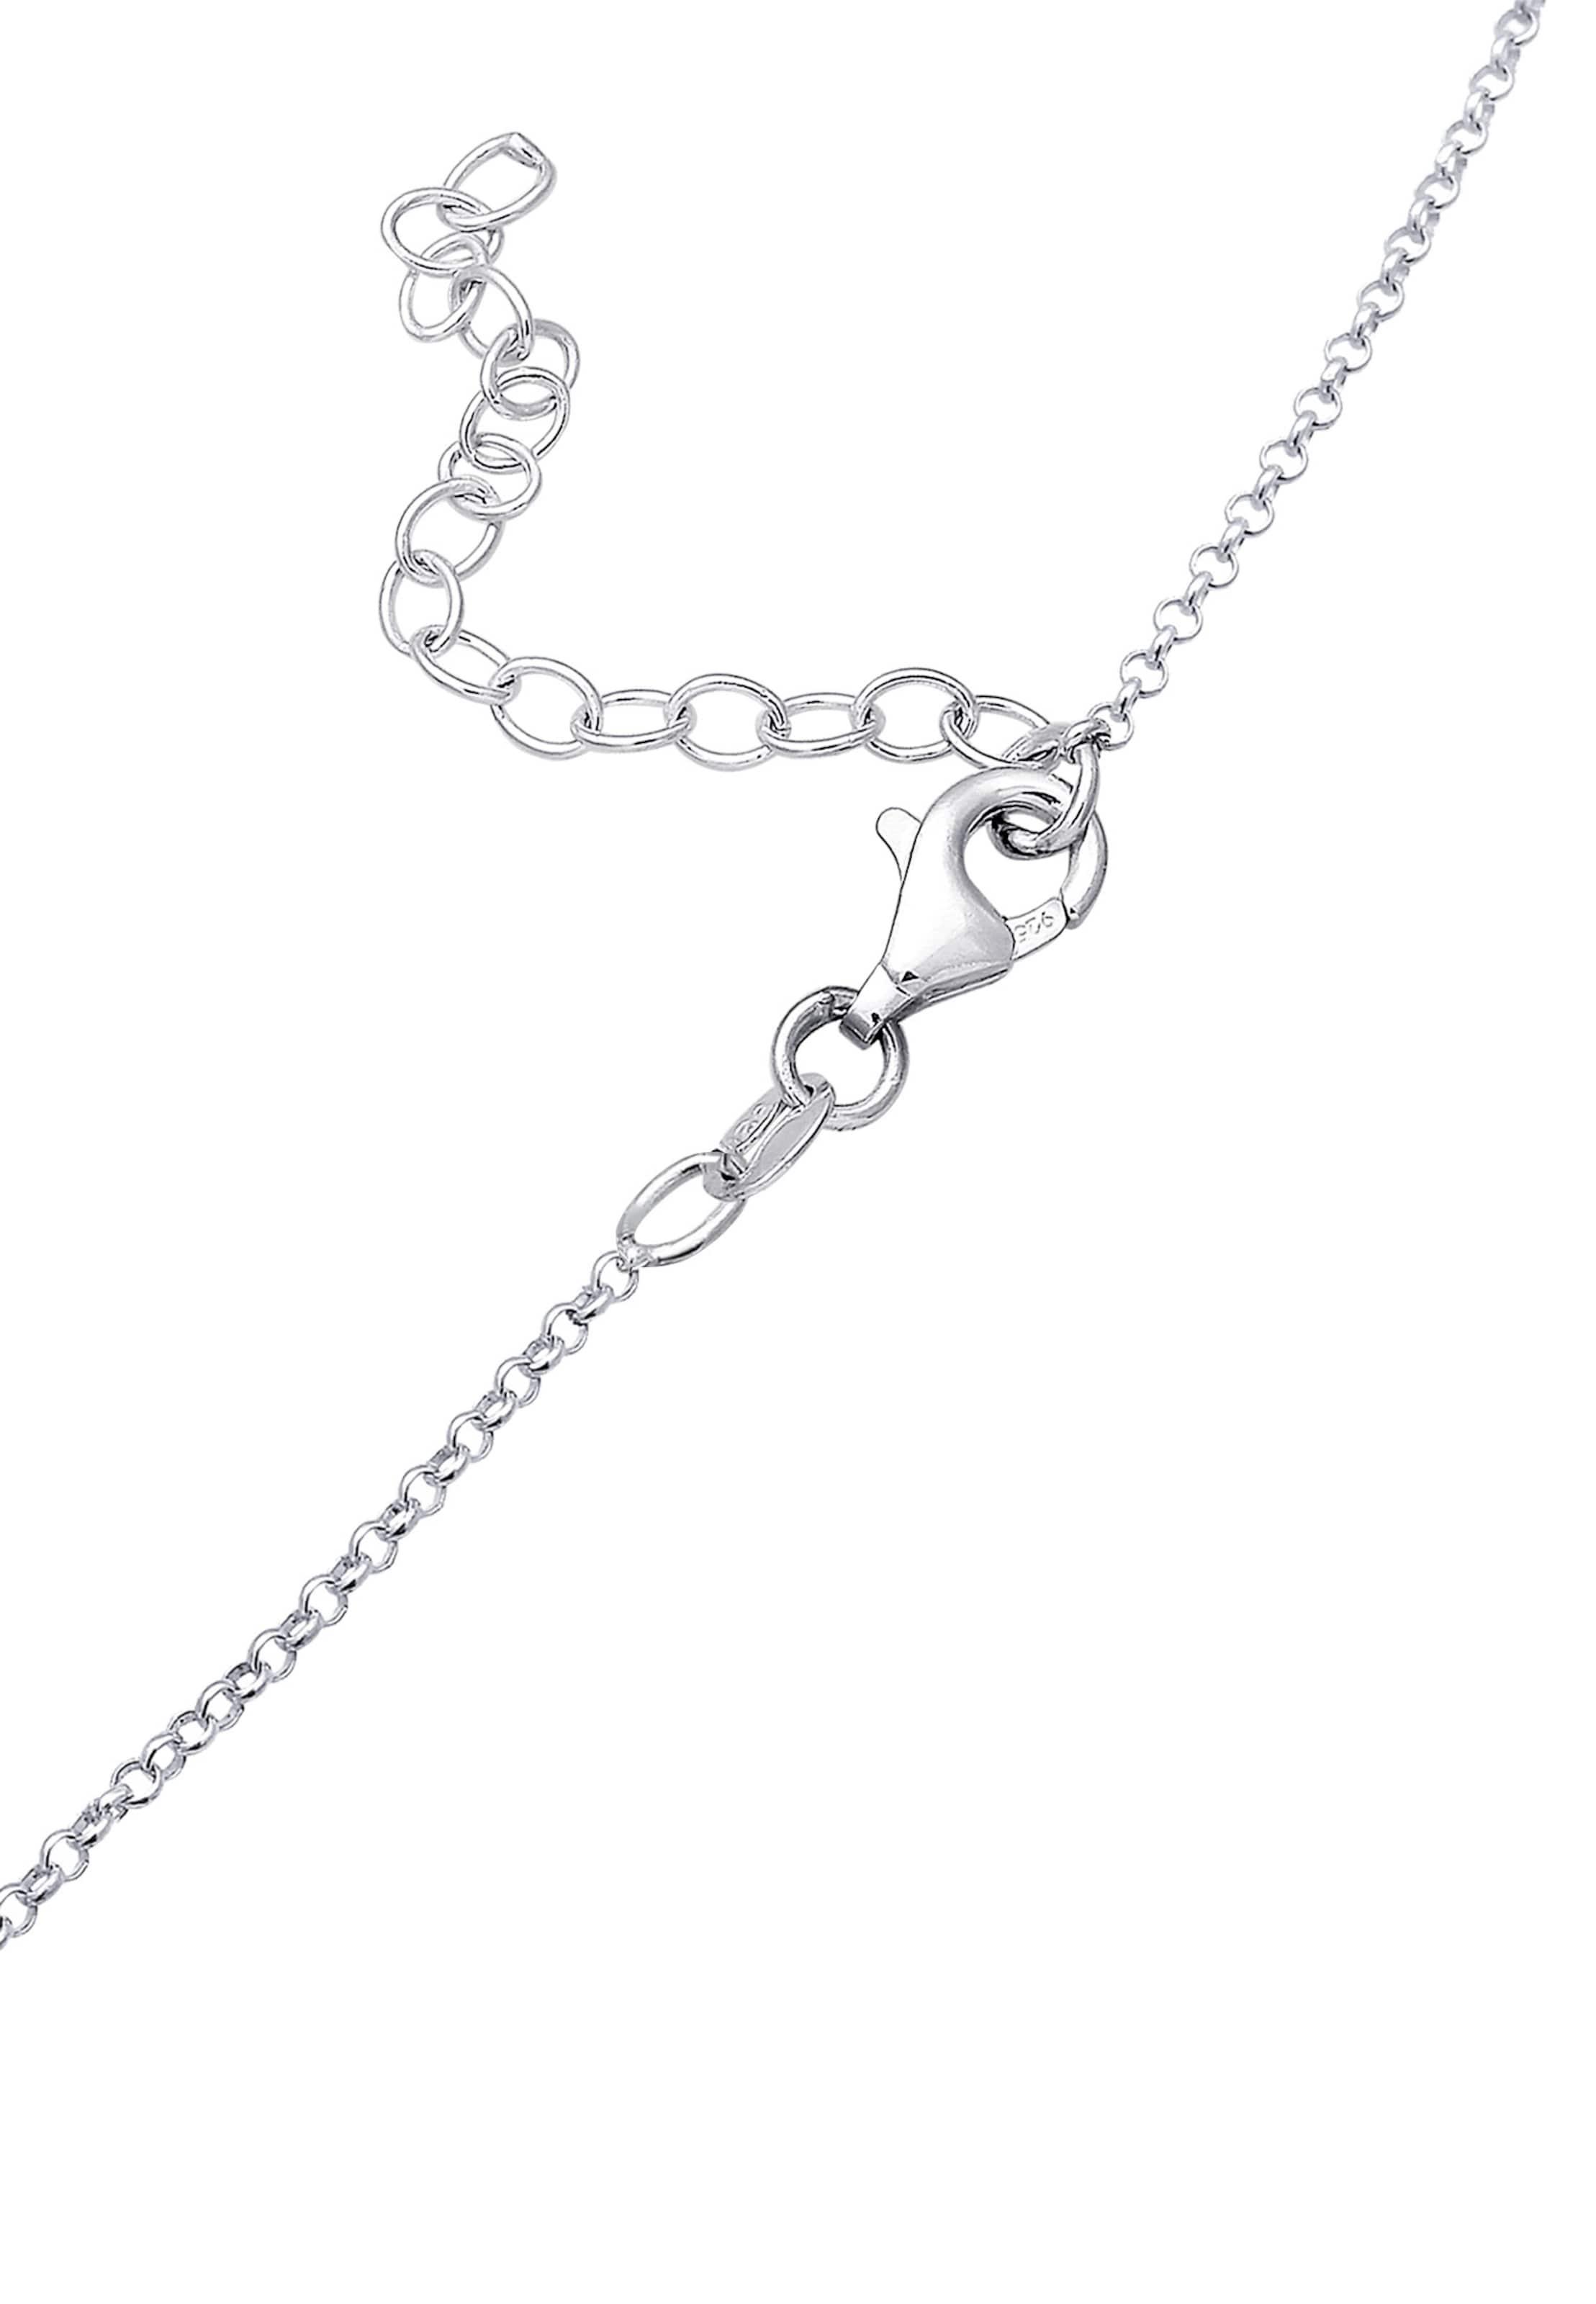 'astroChokerSterne' Kette Silber In Elli Elli bf6yYg7v